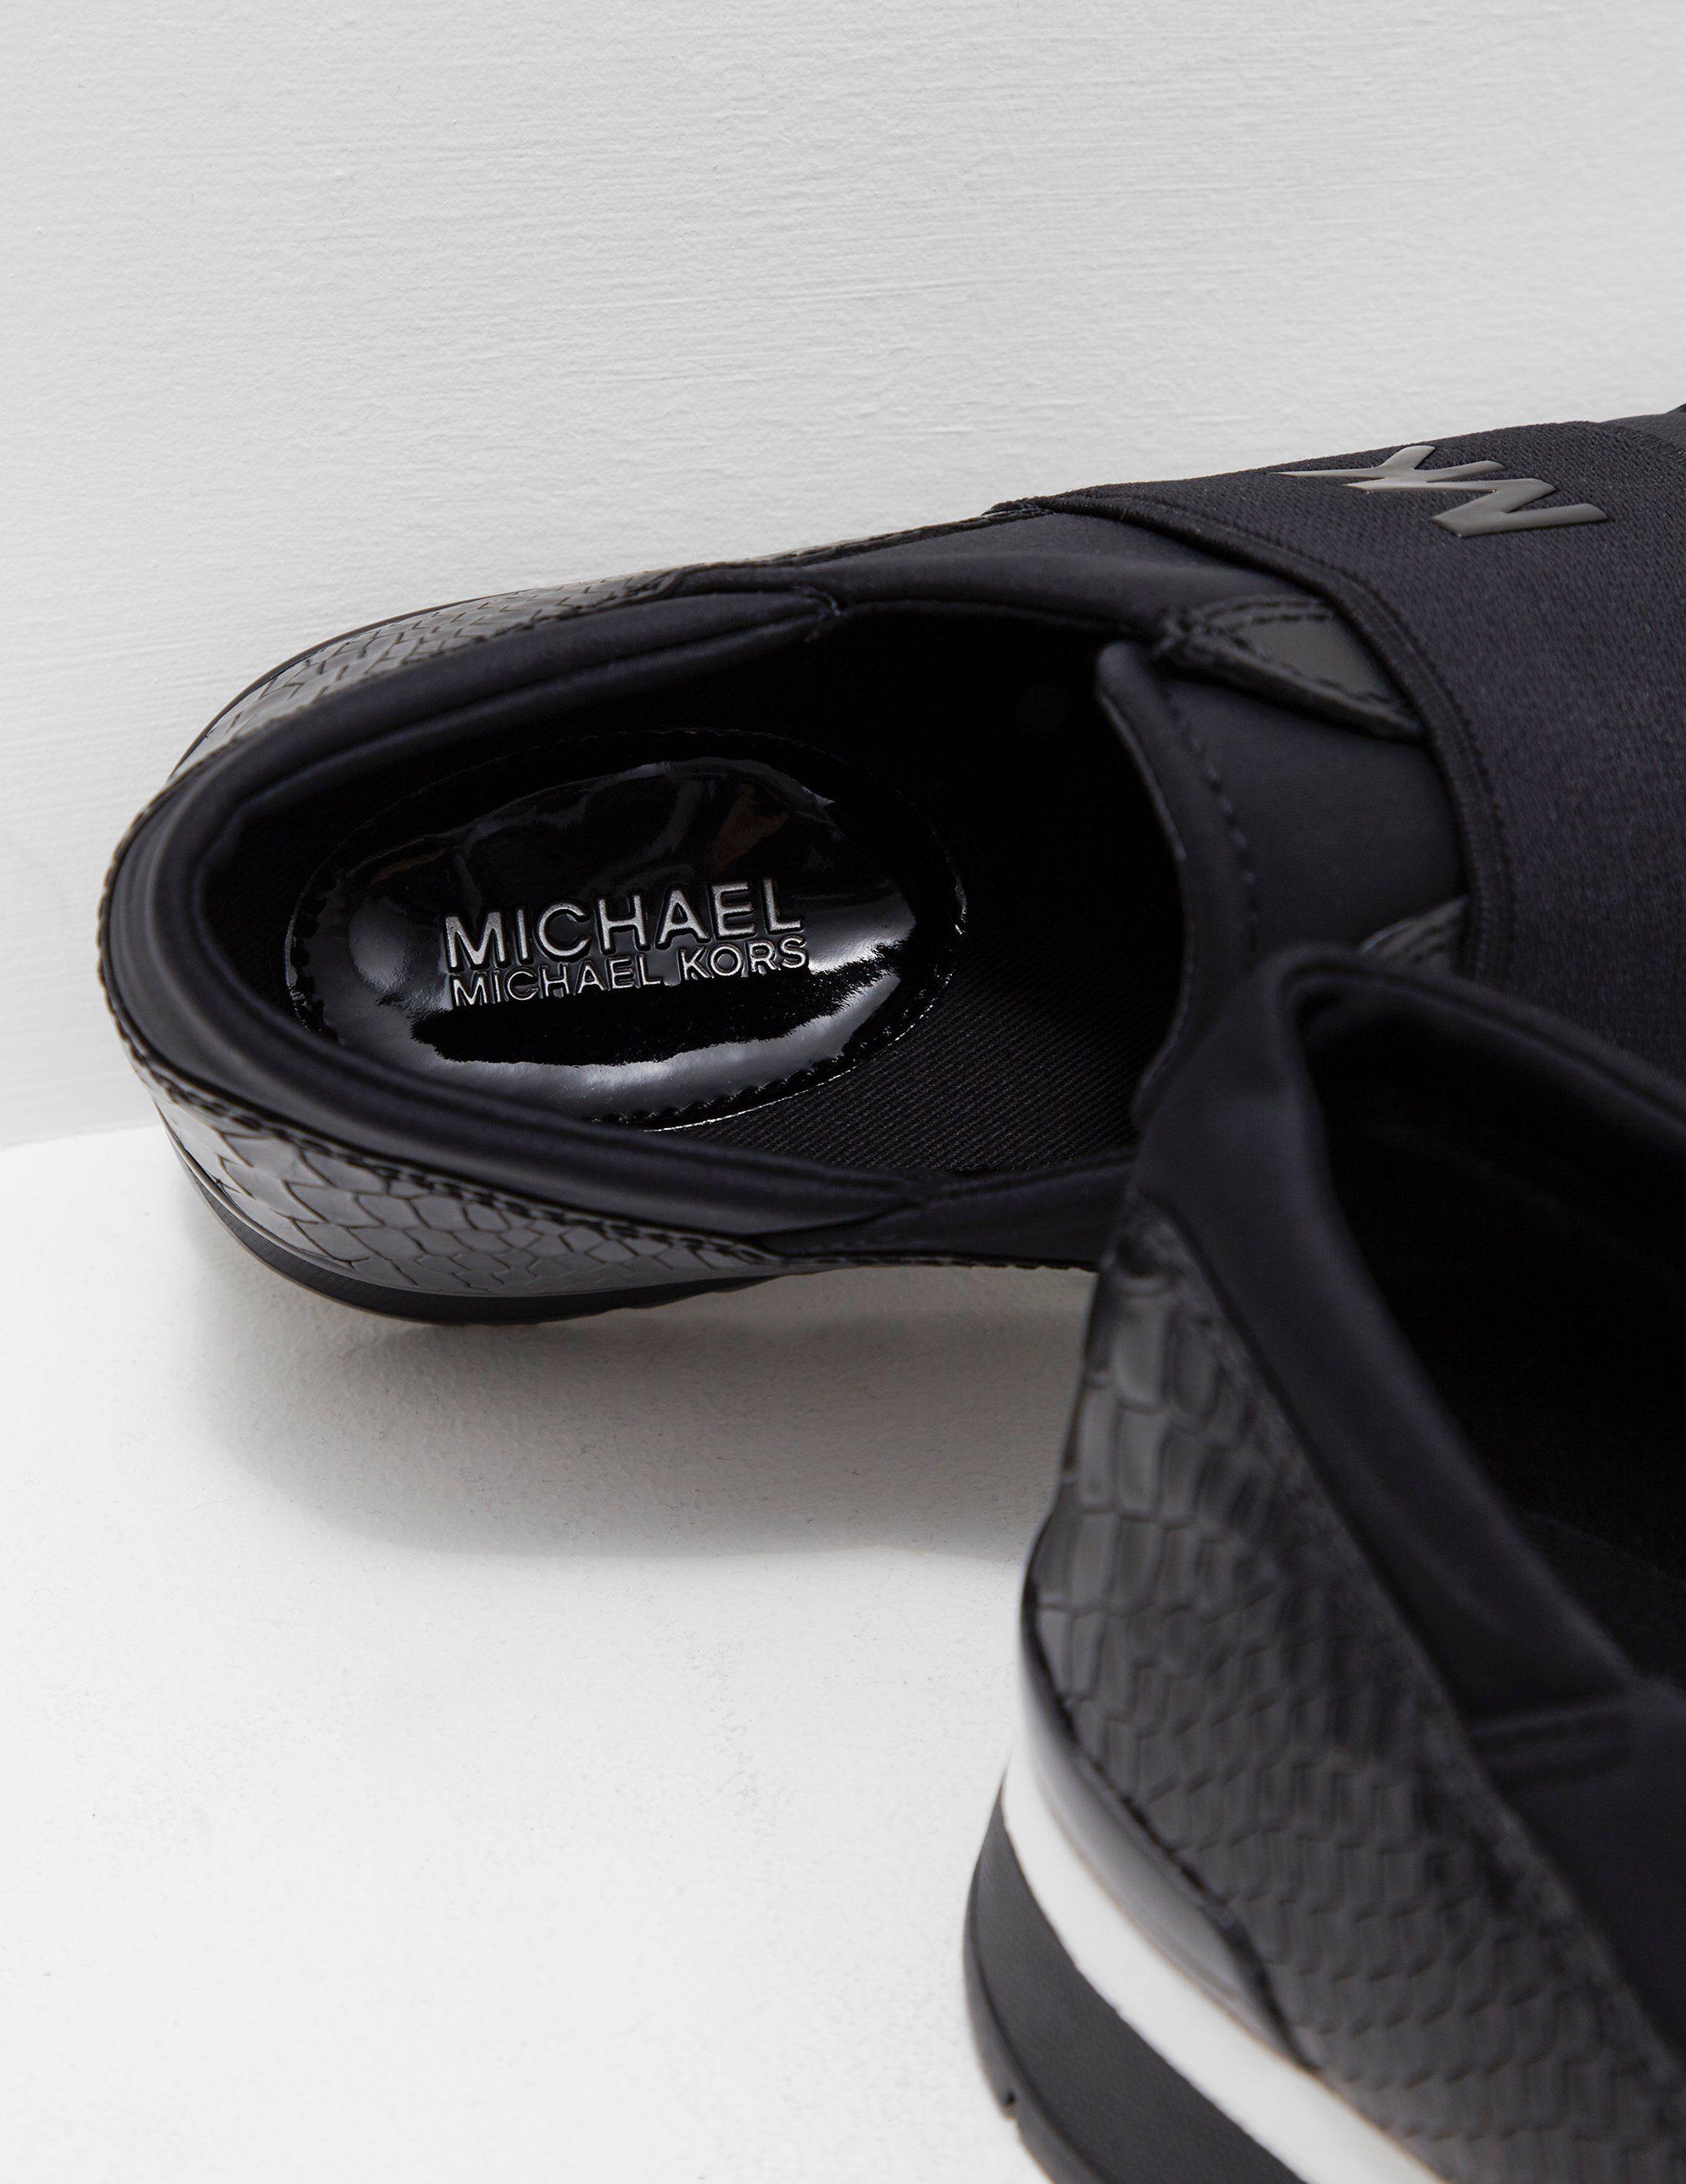 Michael Kors MK Trainer